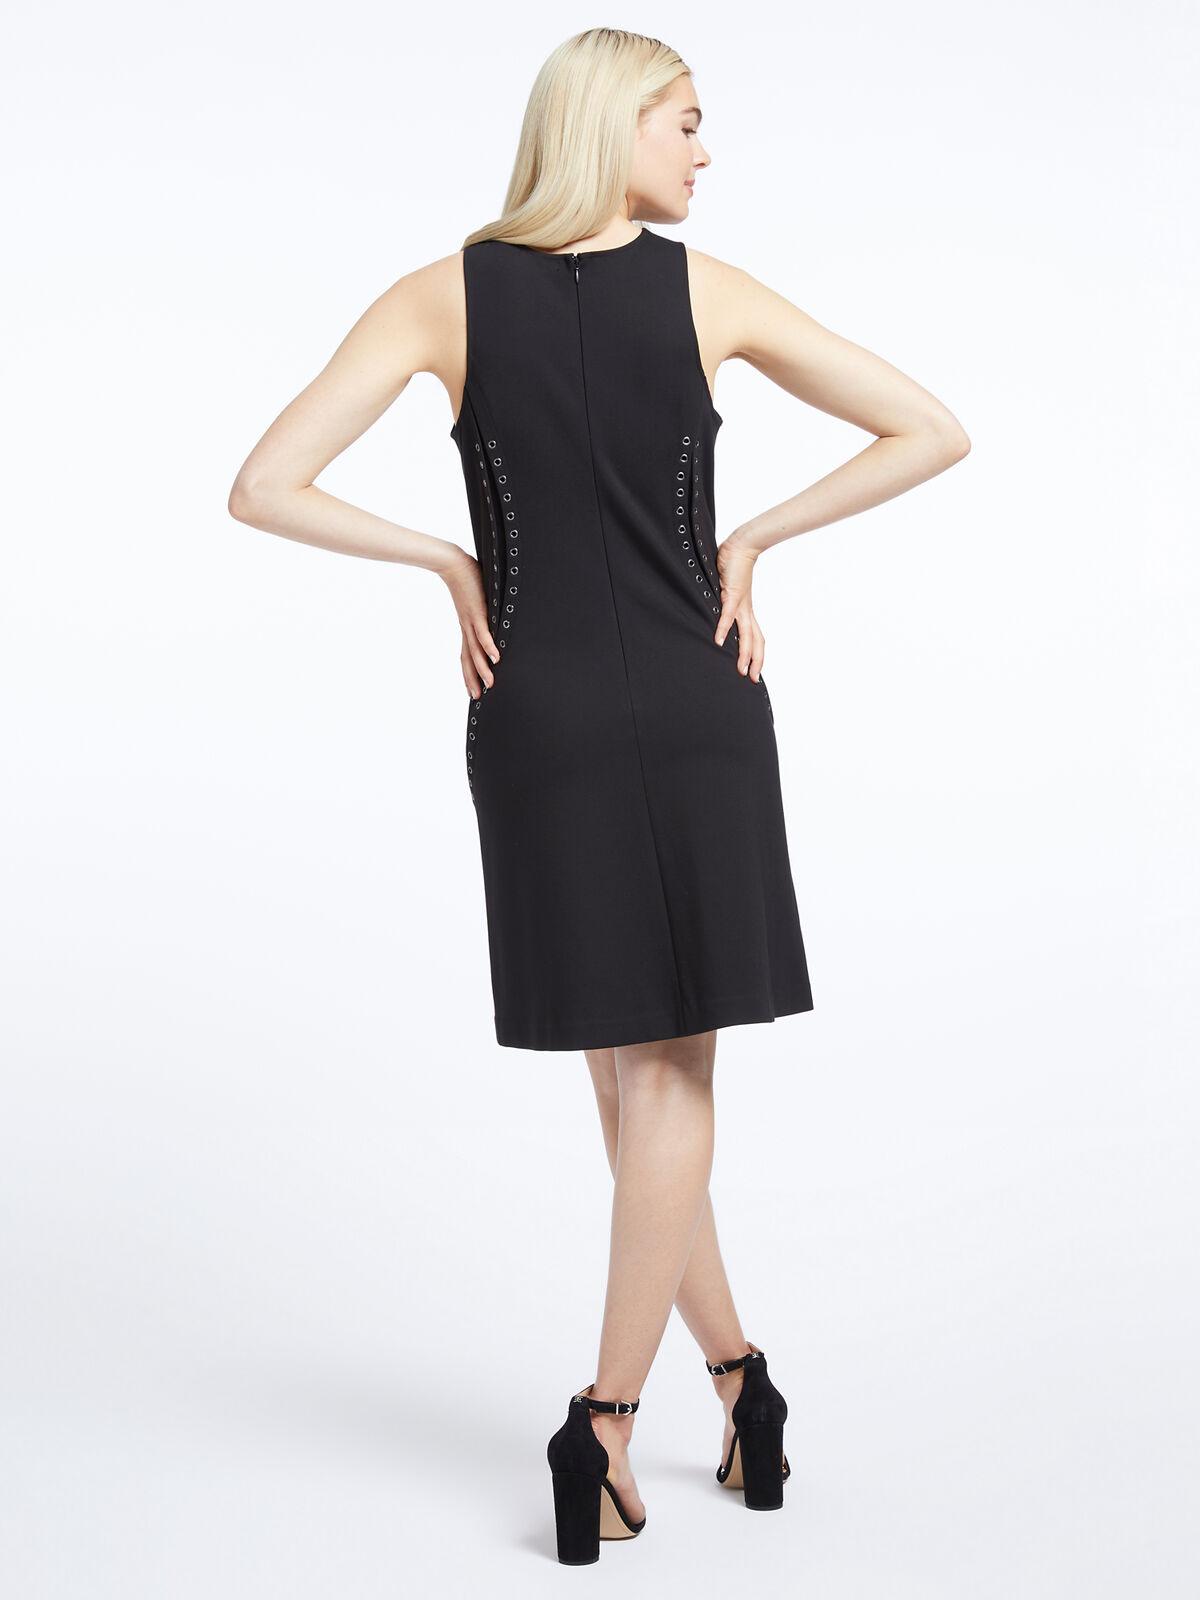 Links Dress